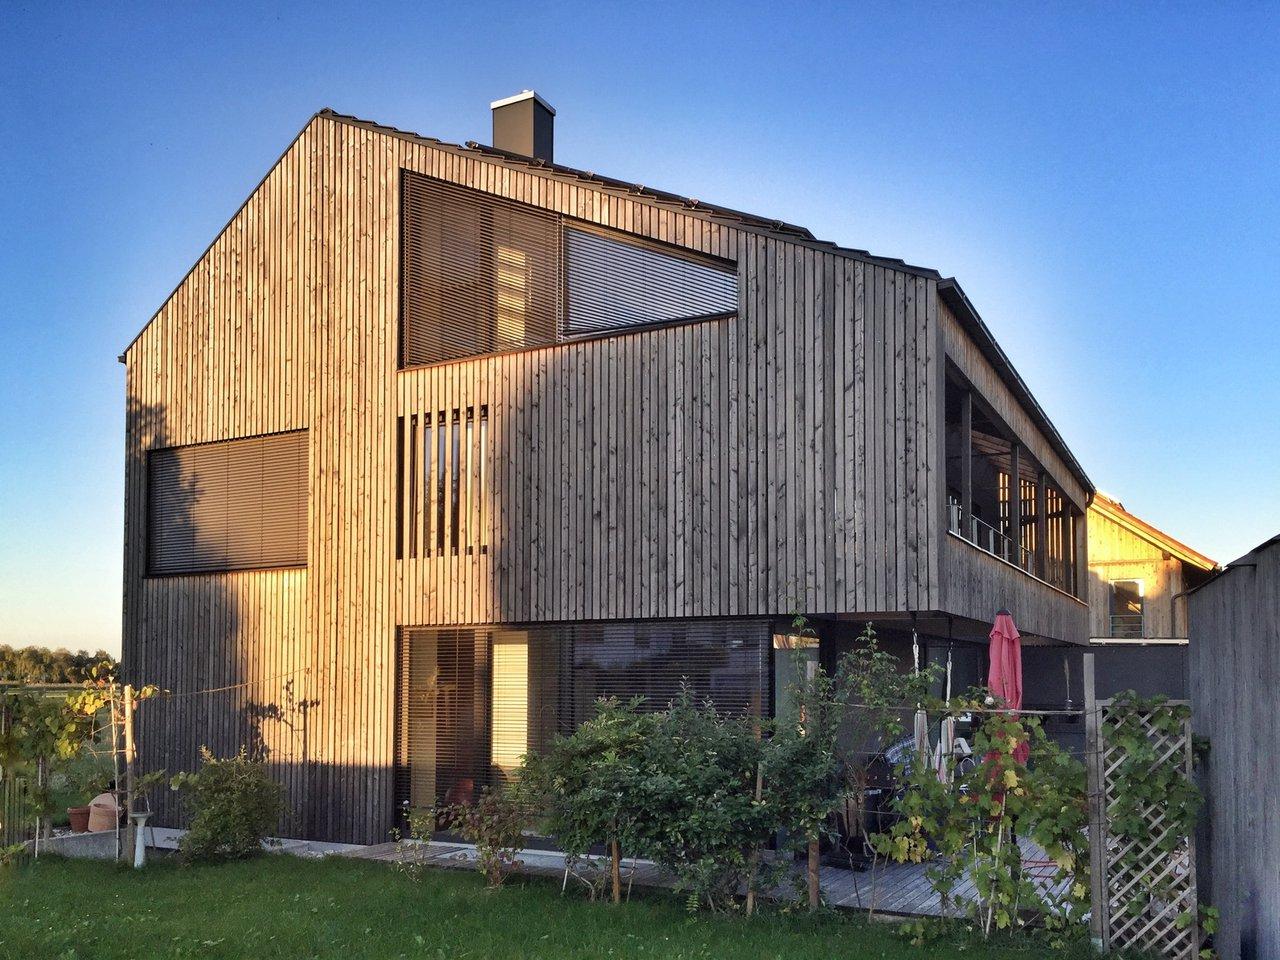 Holzfassaden Schone Optik Gute Warmedammung Erich Wober Gmbh